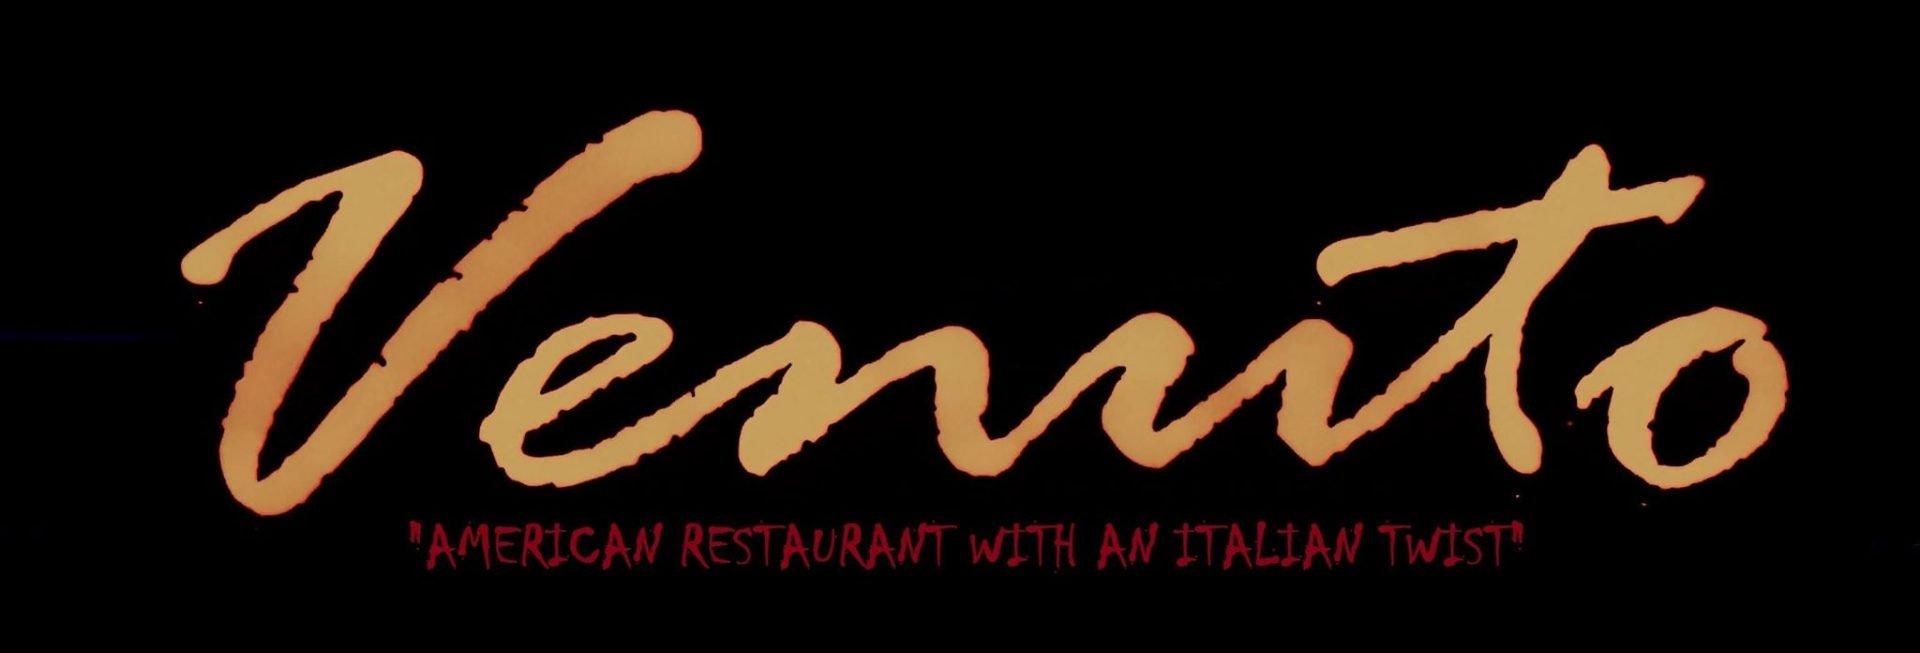 Venuto Restaurant Virginia Beach